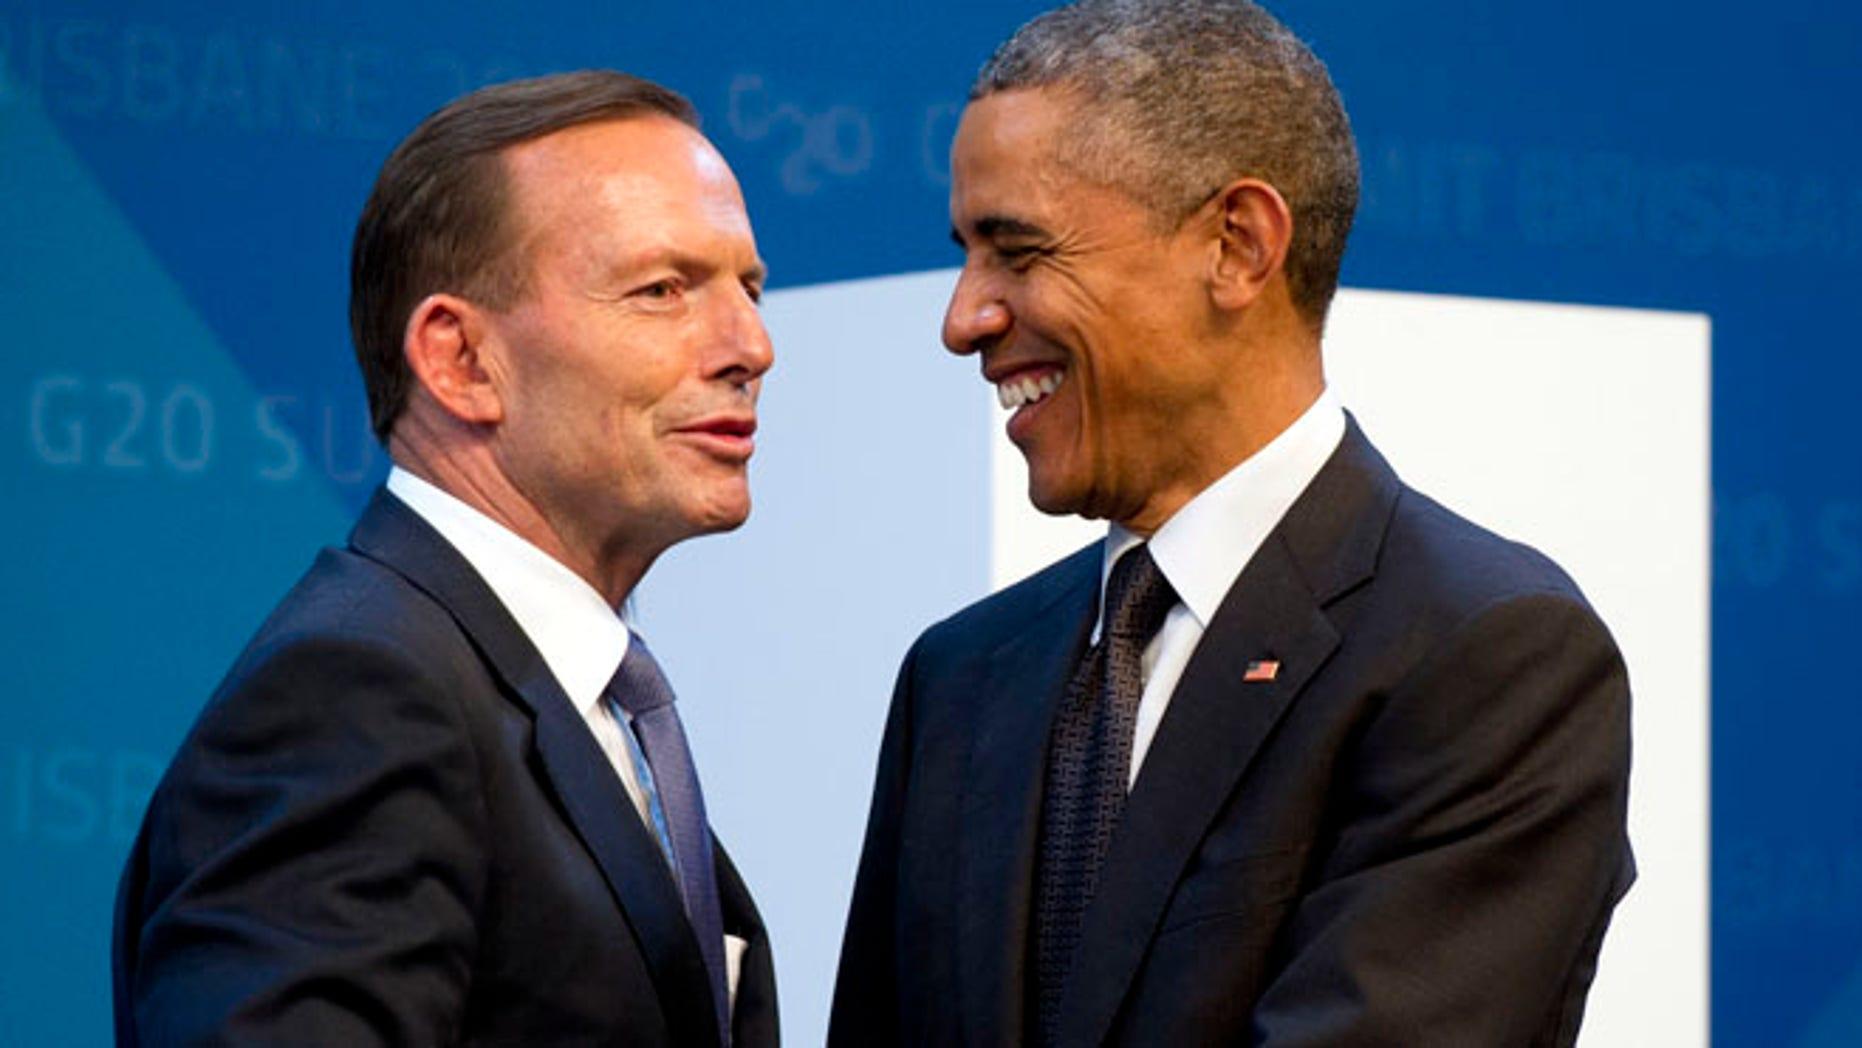 Nov. 15, 2014: U.S. President Barack Obama, right, is welcomed by Australia's Prime Minister Tony Abbott upon arrival for the G20 Summit in Brisbane, Australia. (AP)